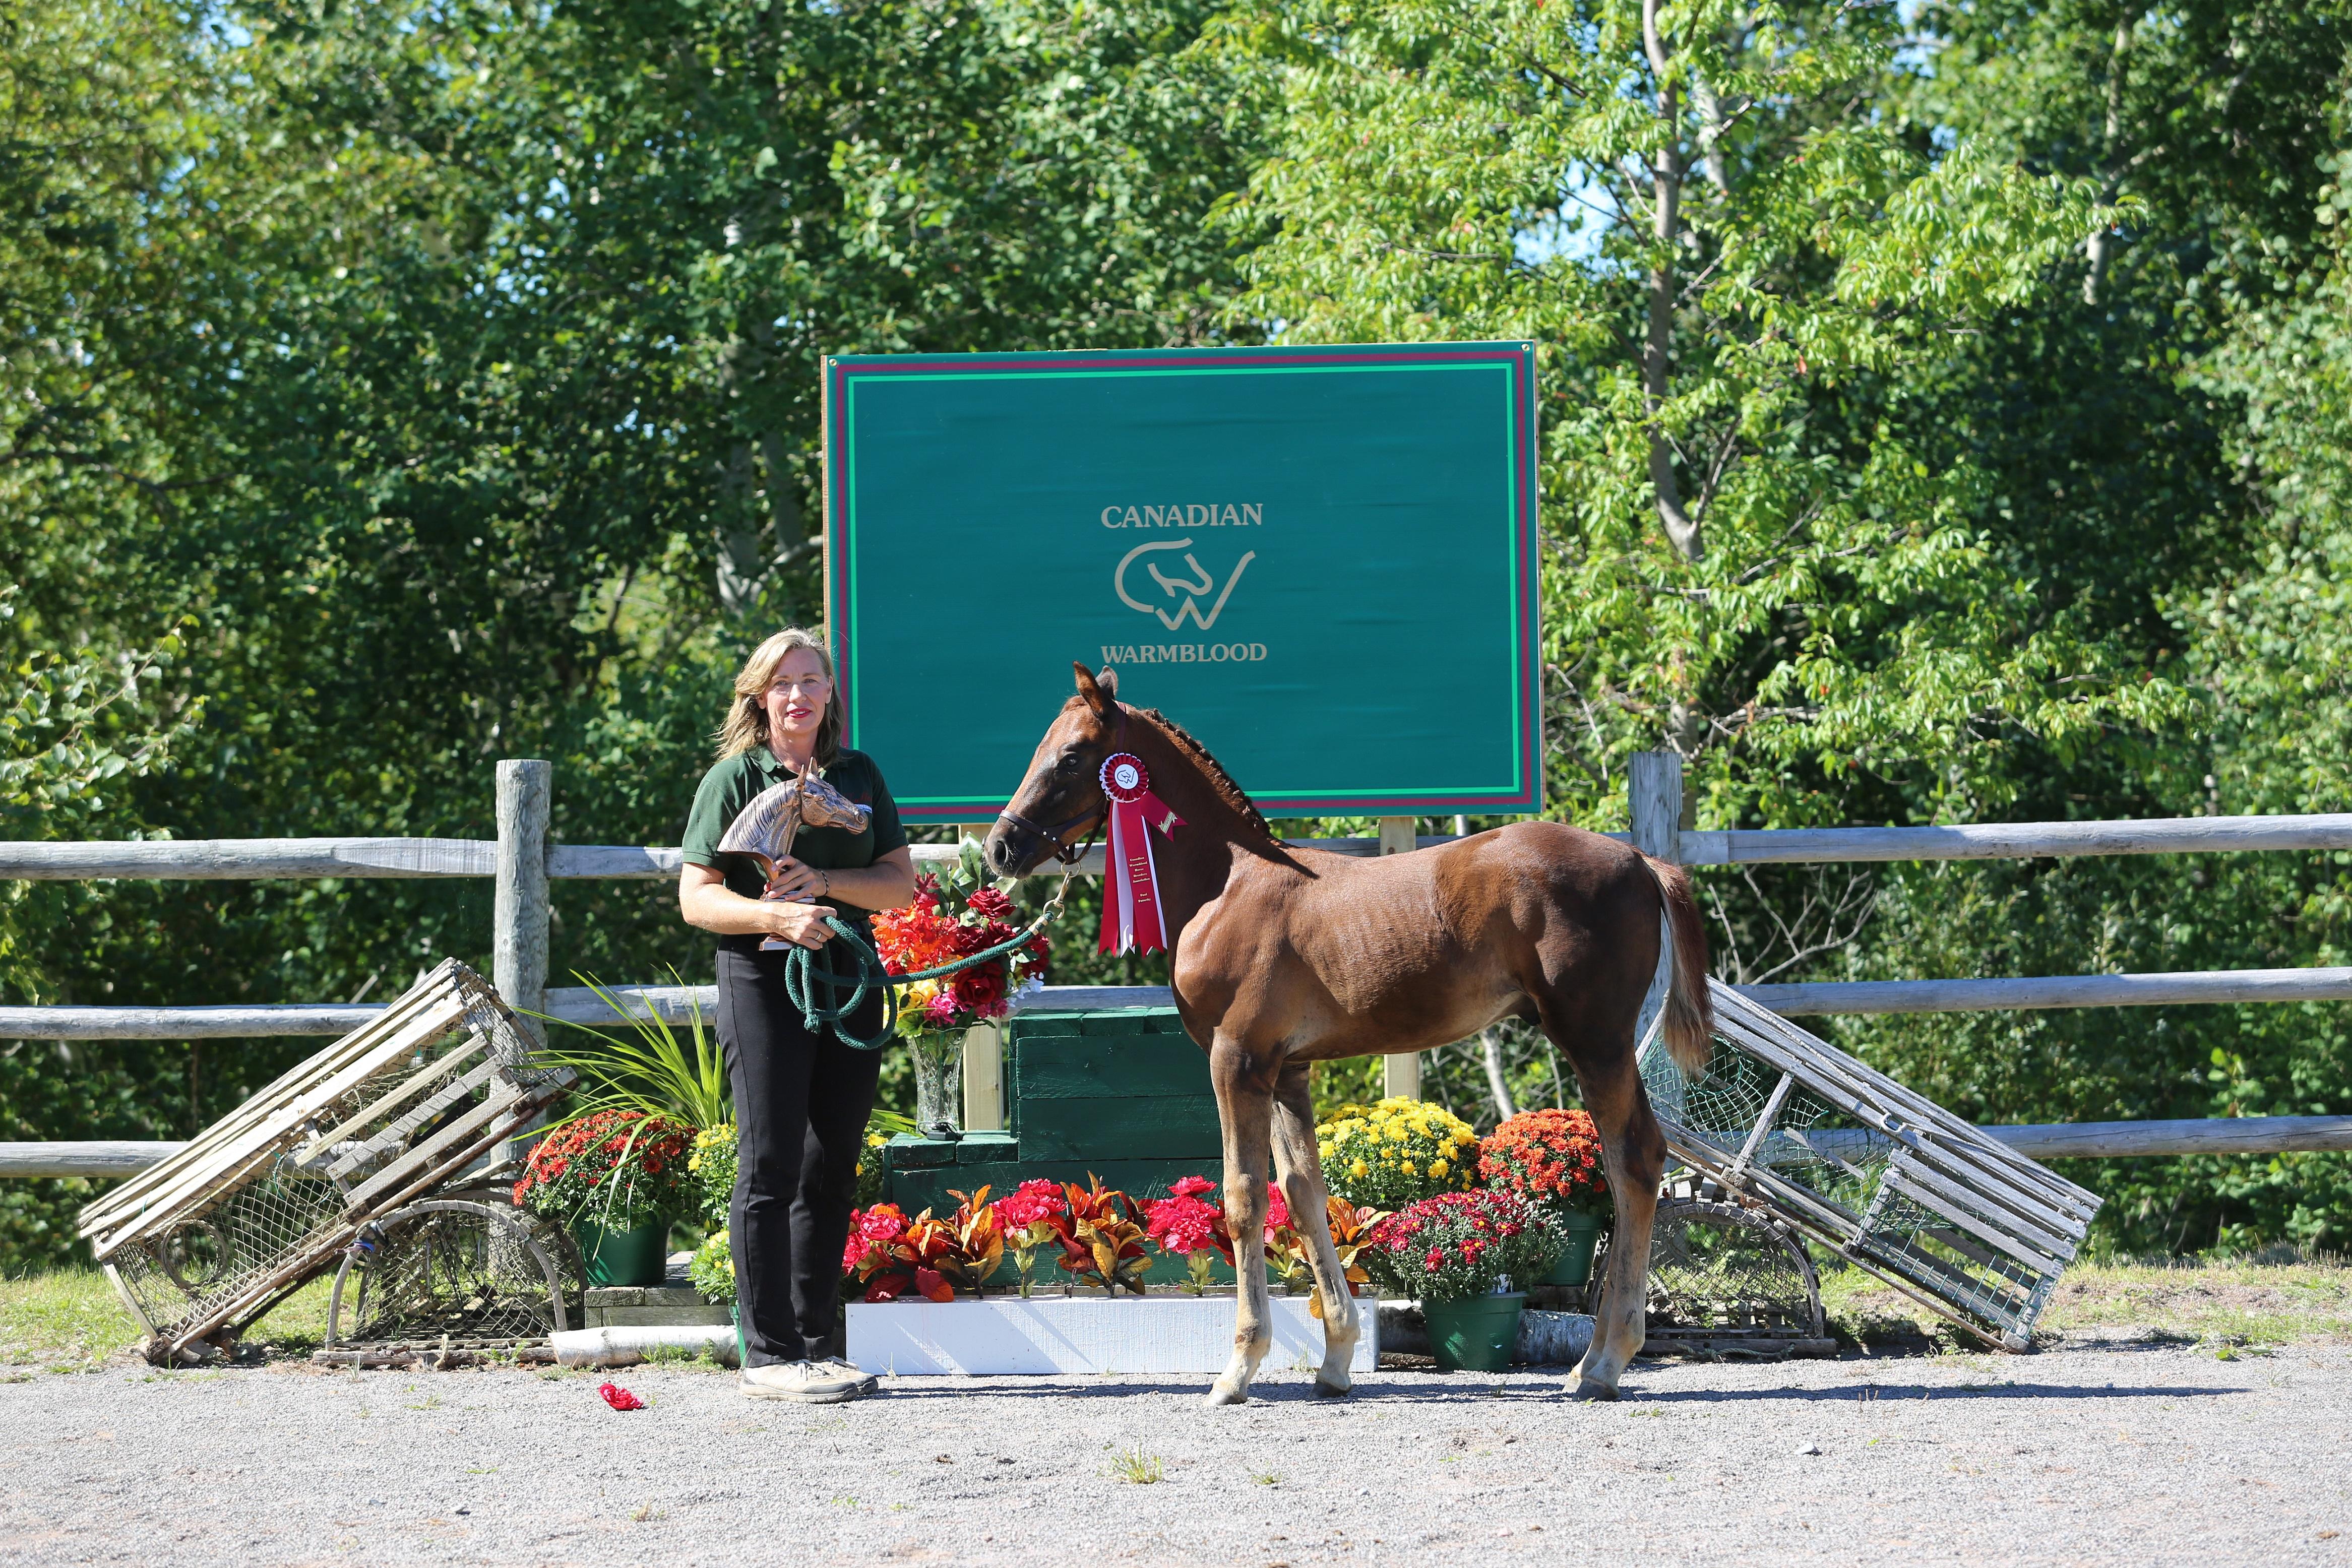 CWHBA SSA Foal Futurity Winner FPH Maxwelton/Viva Voltaire/Jumars